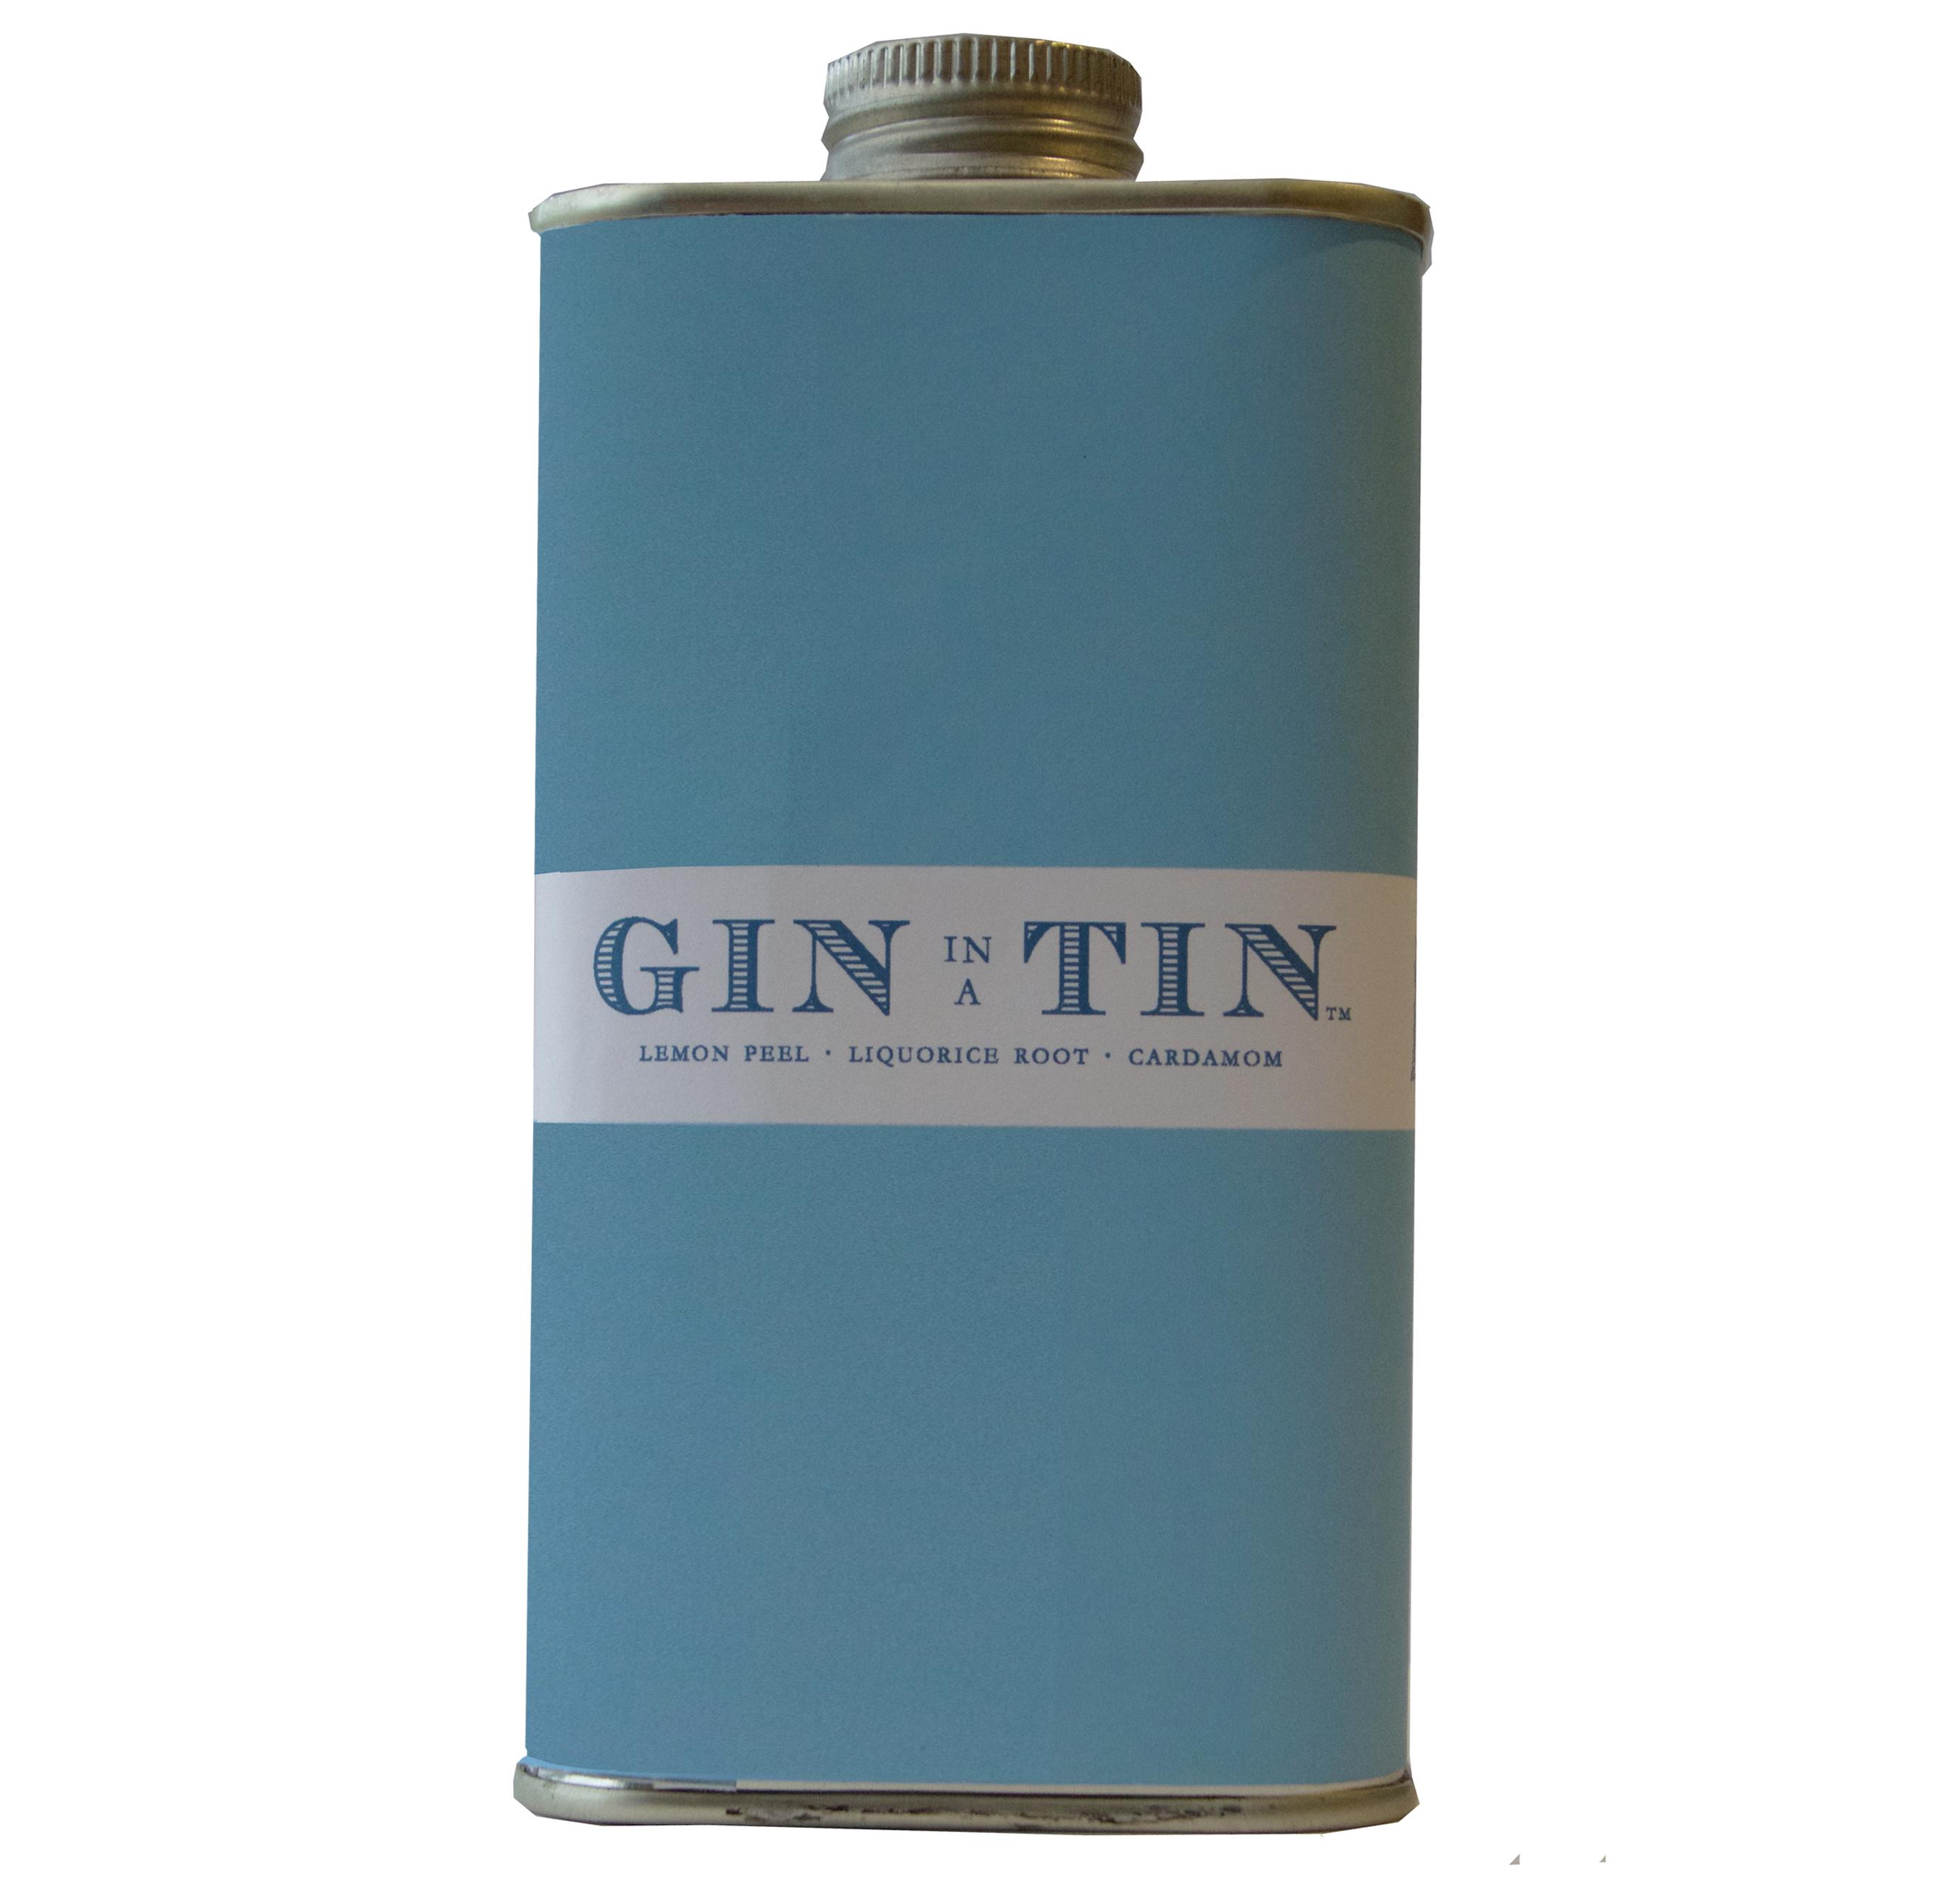 GIN IN A TIN - LEMON PEEL, CORIANDER & CARDAMOM NO.2